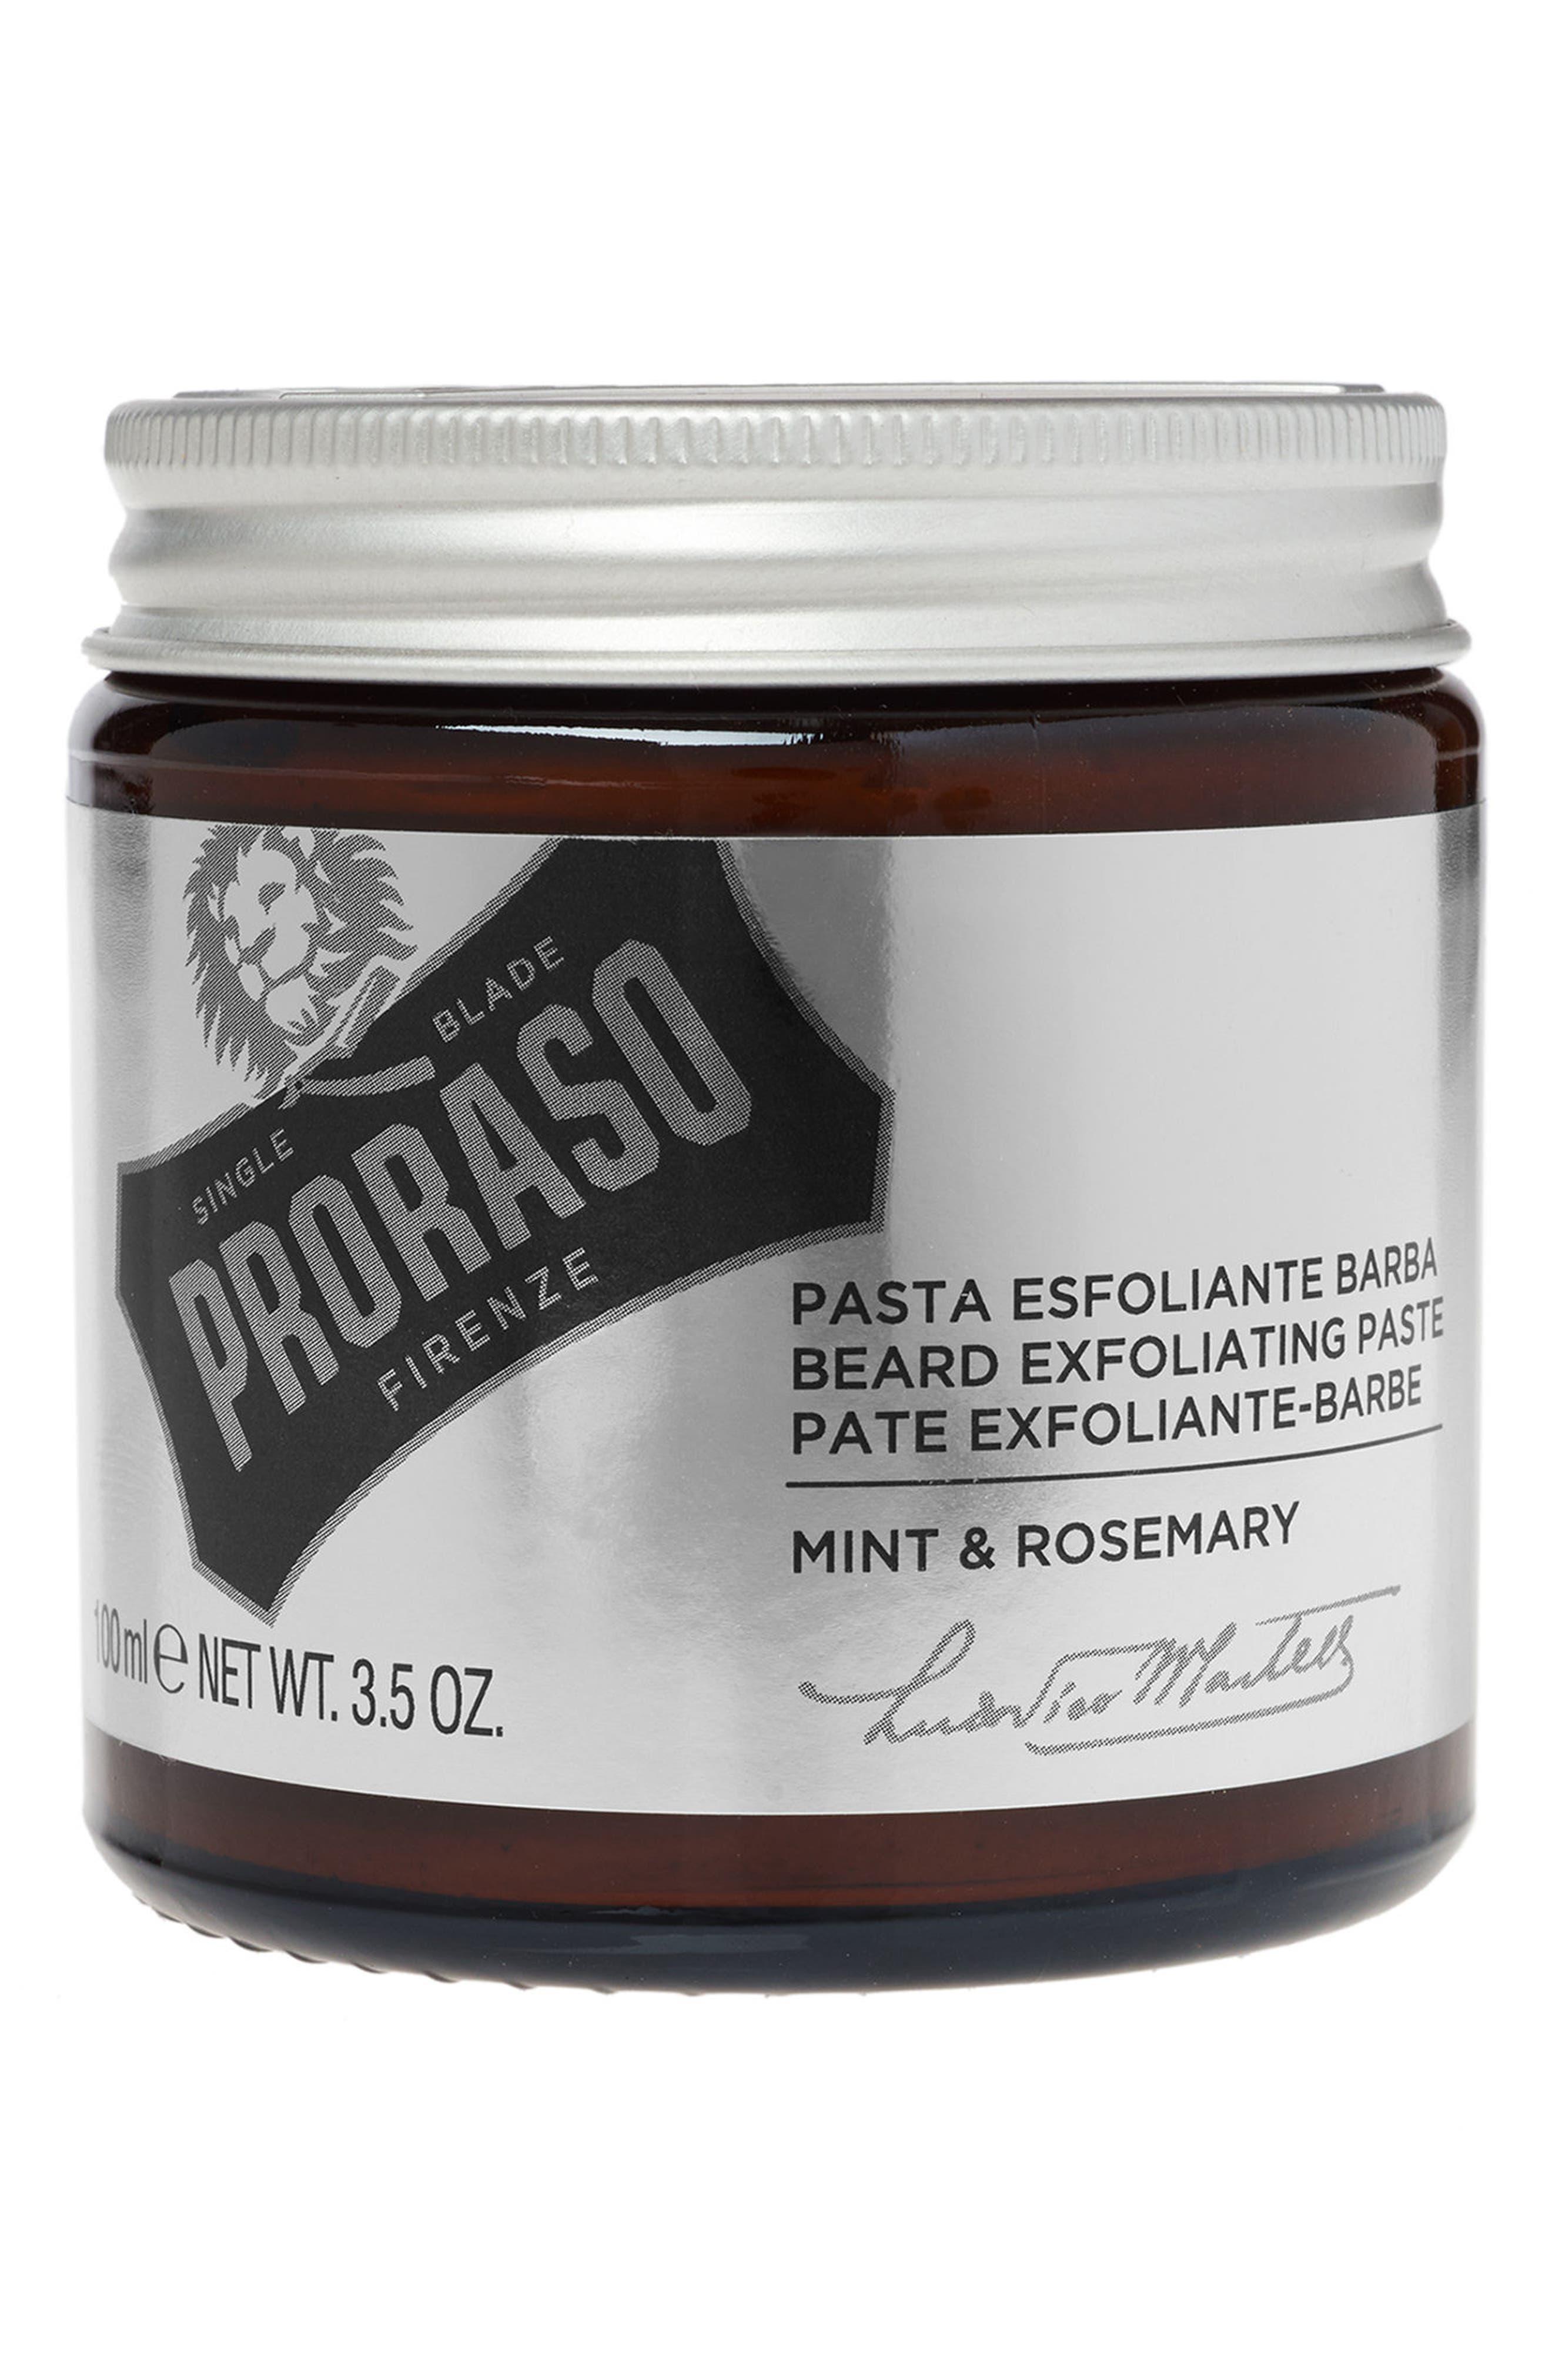 Men's Grooming Beard Exfoliate Paste,                             Main thumbnail 1, color,                             No Color